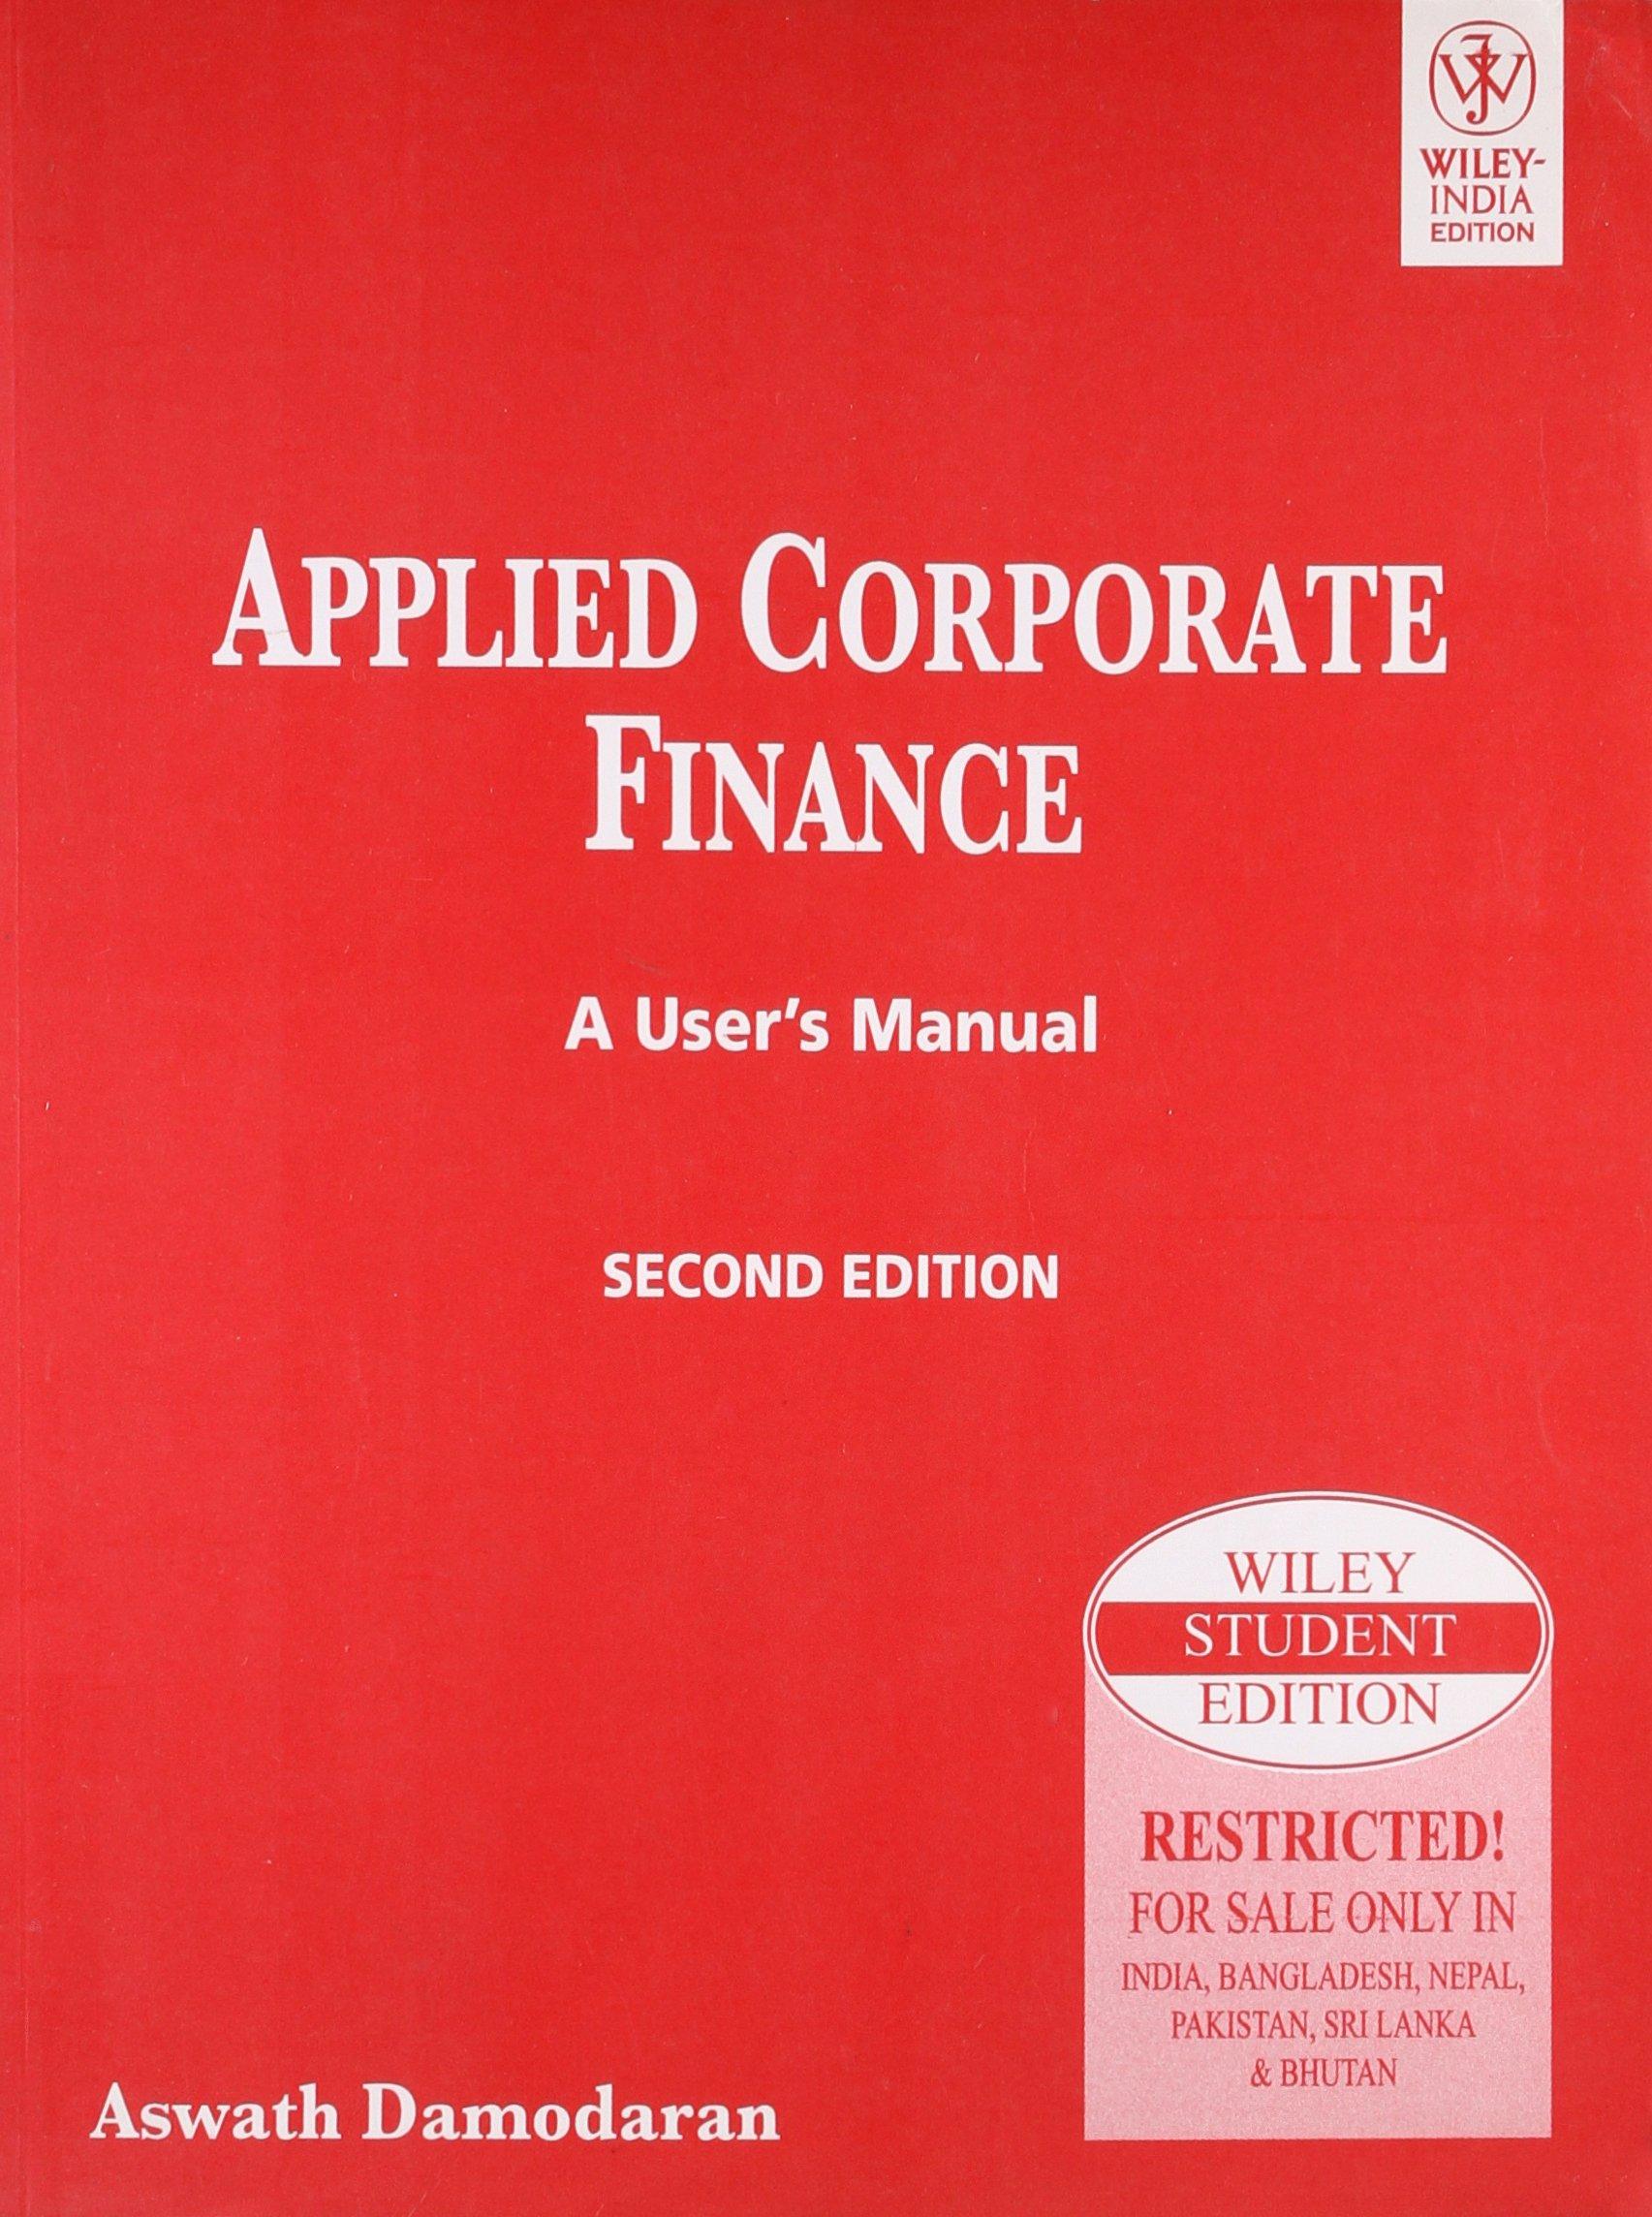 amazon com applied corporate finance a user s manual 2nd ed rh amazon com